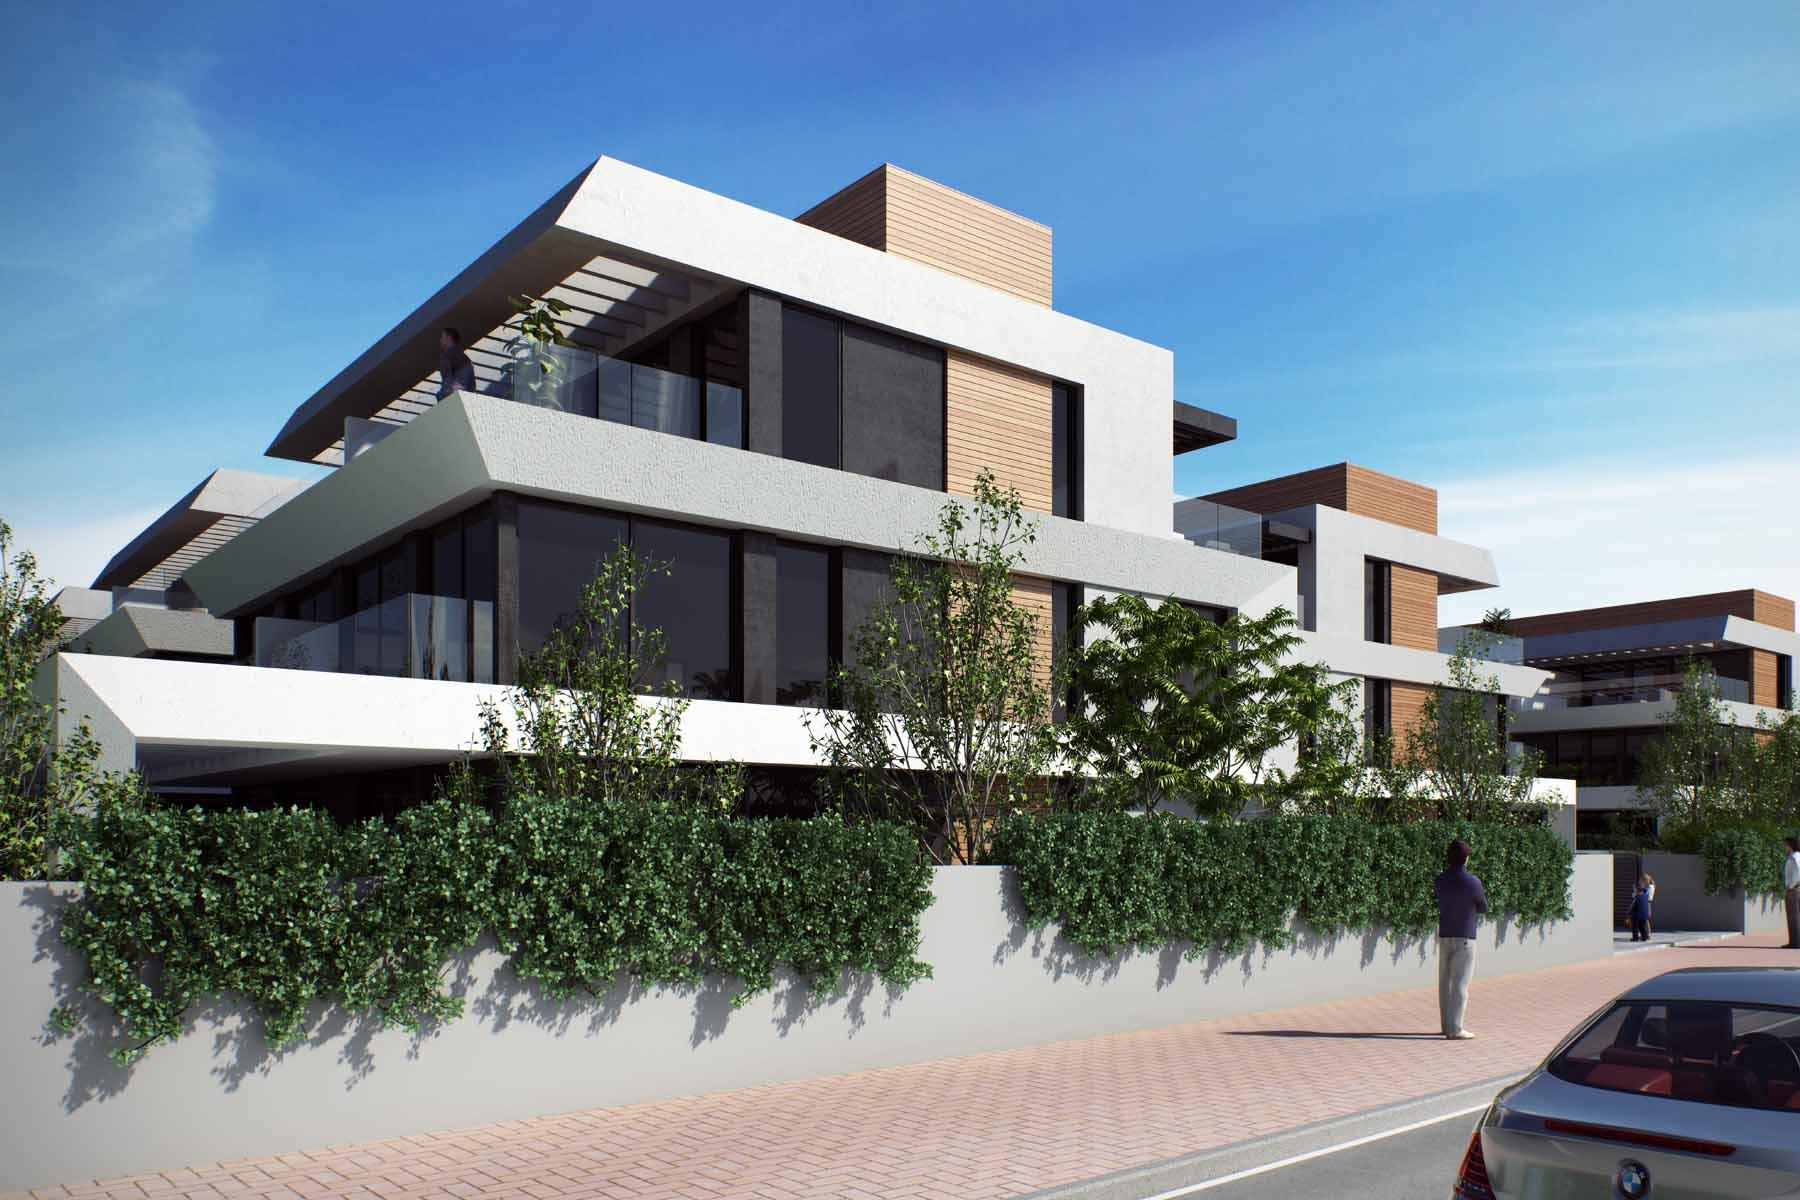 Additional photo for property listing at Exclusive Semi-Detached Villa No.1 特拉维夫, 以色列 以色列